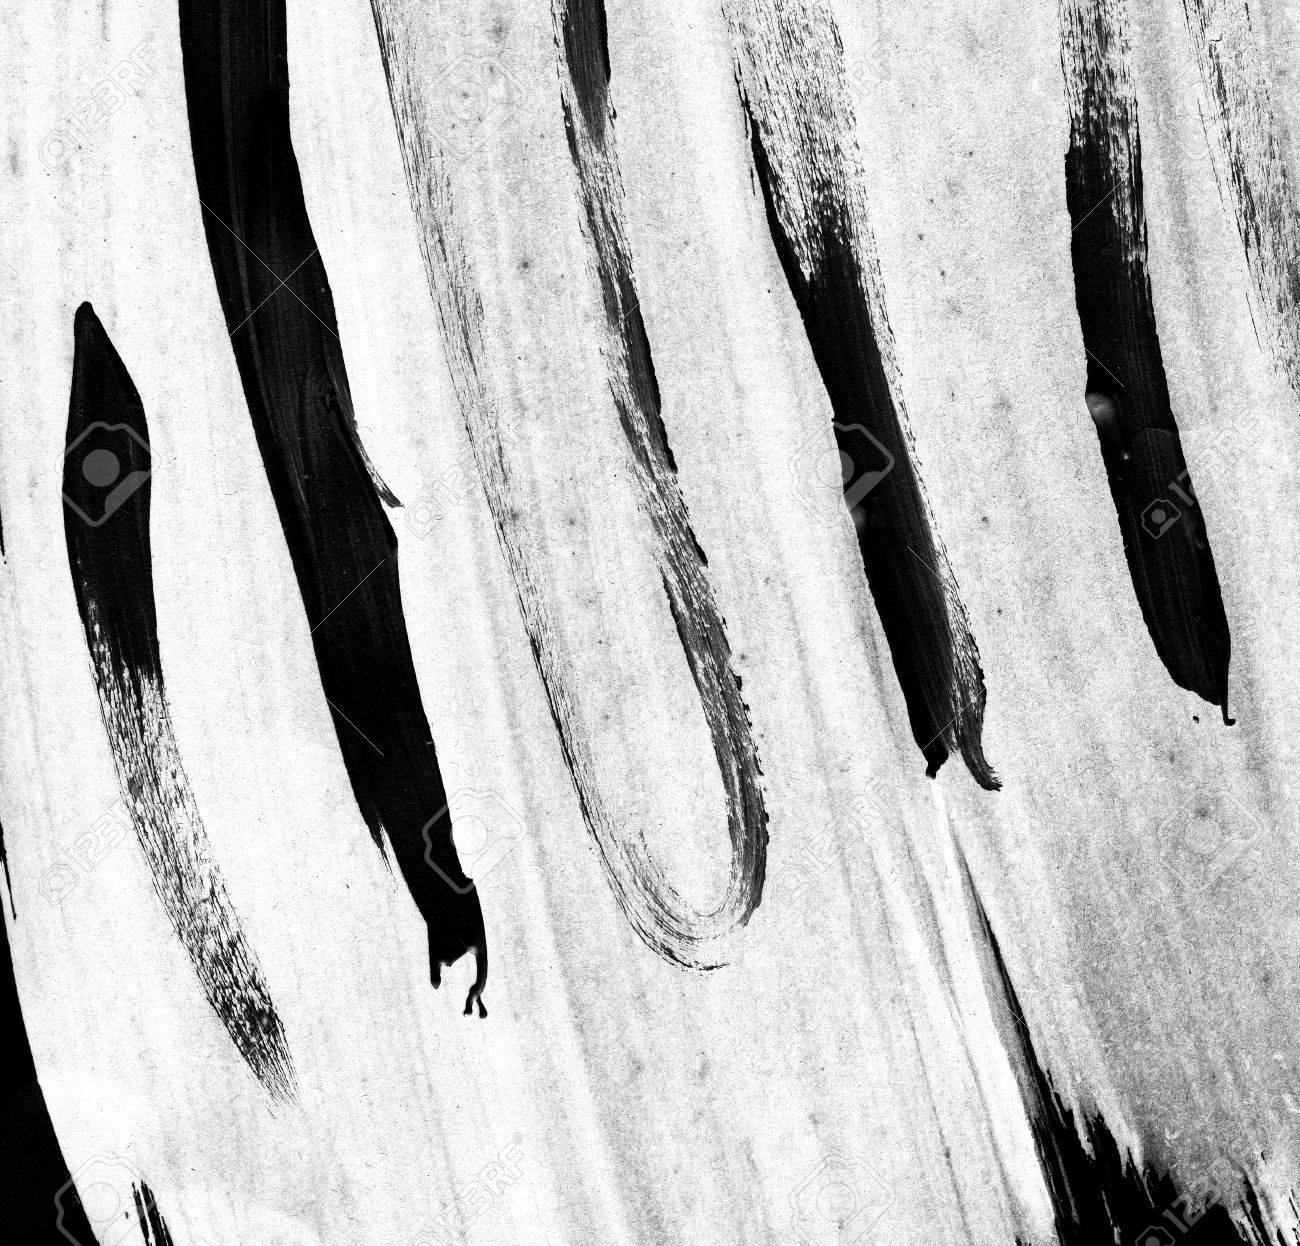 Very Hight Resolution Geometric Graffiti Abstract Background